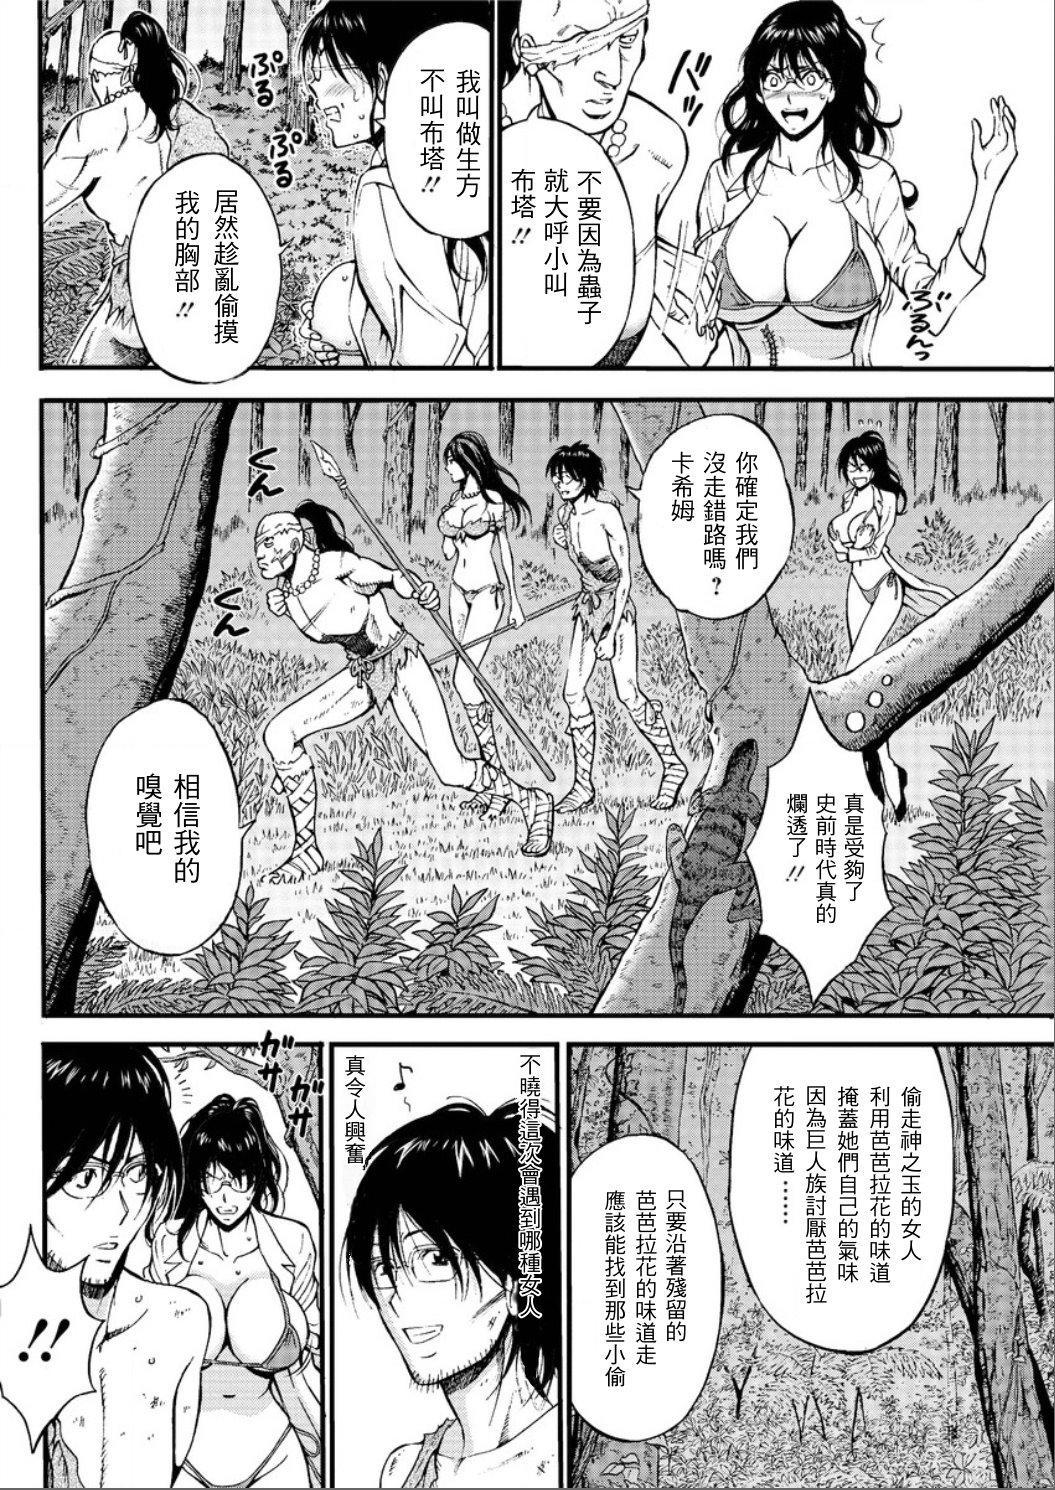 Kigenzen 10000 Nen no Ota | 史前一萬年的宅男 Ch. 19-24 5